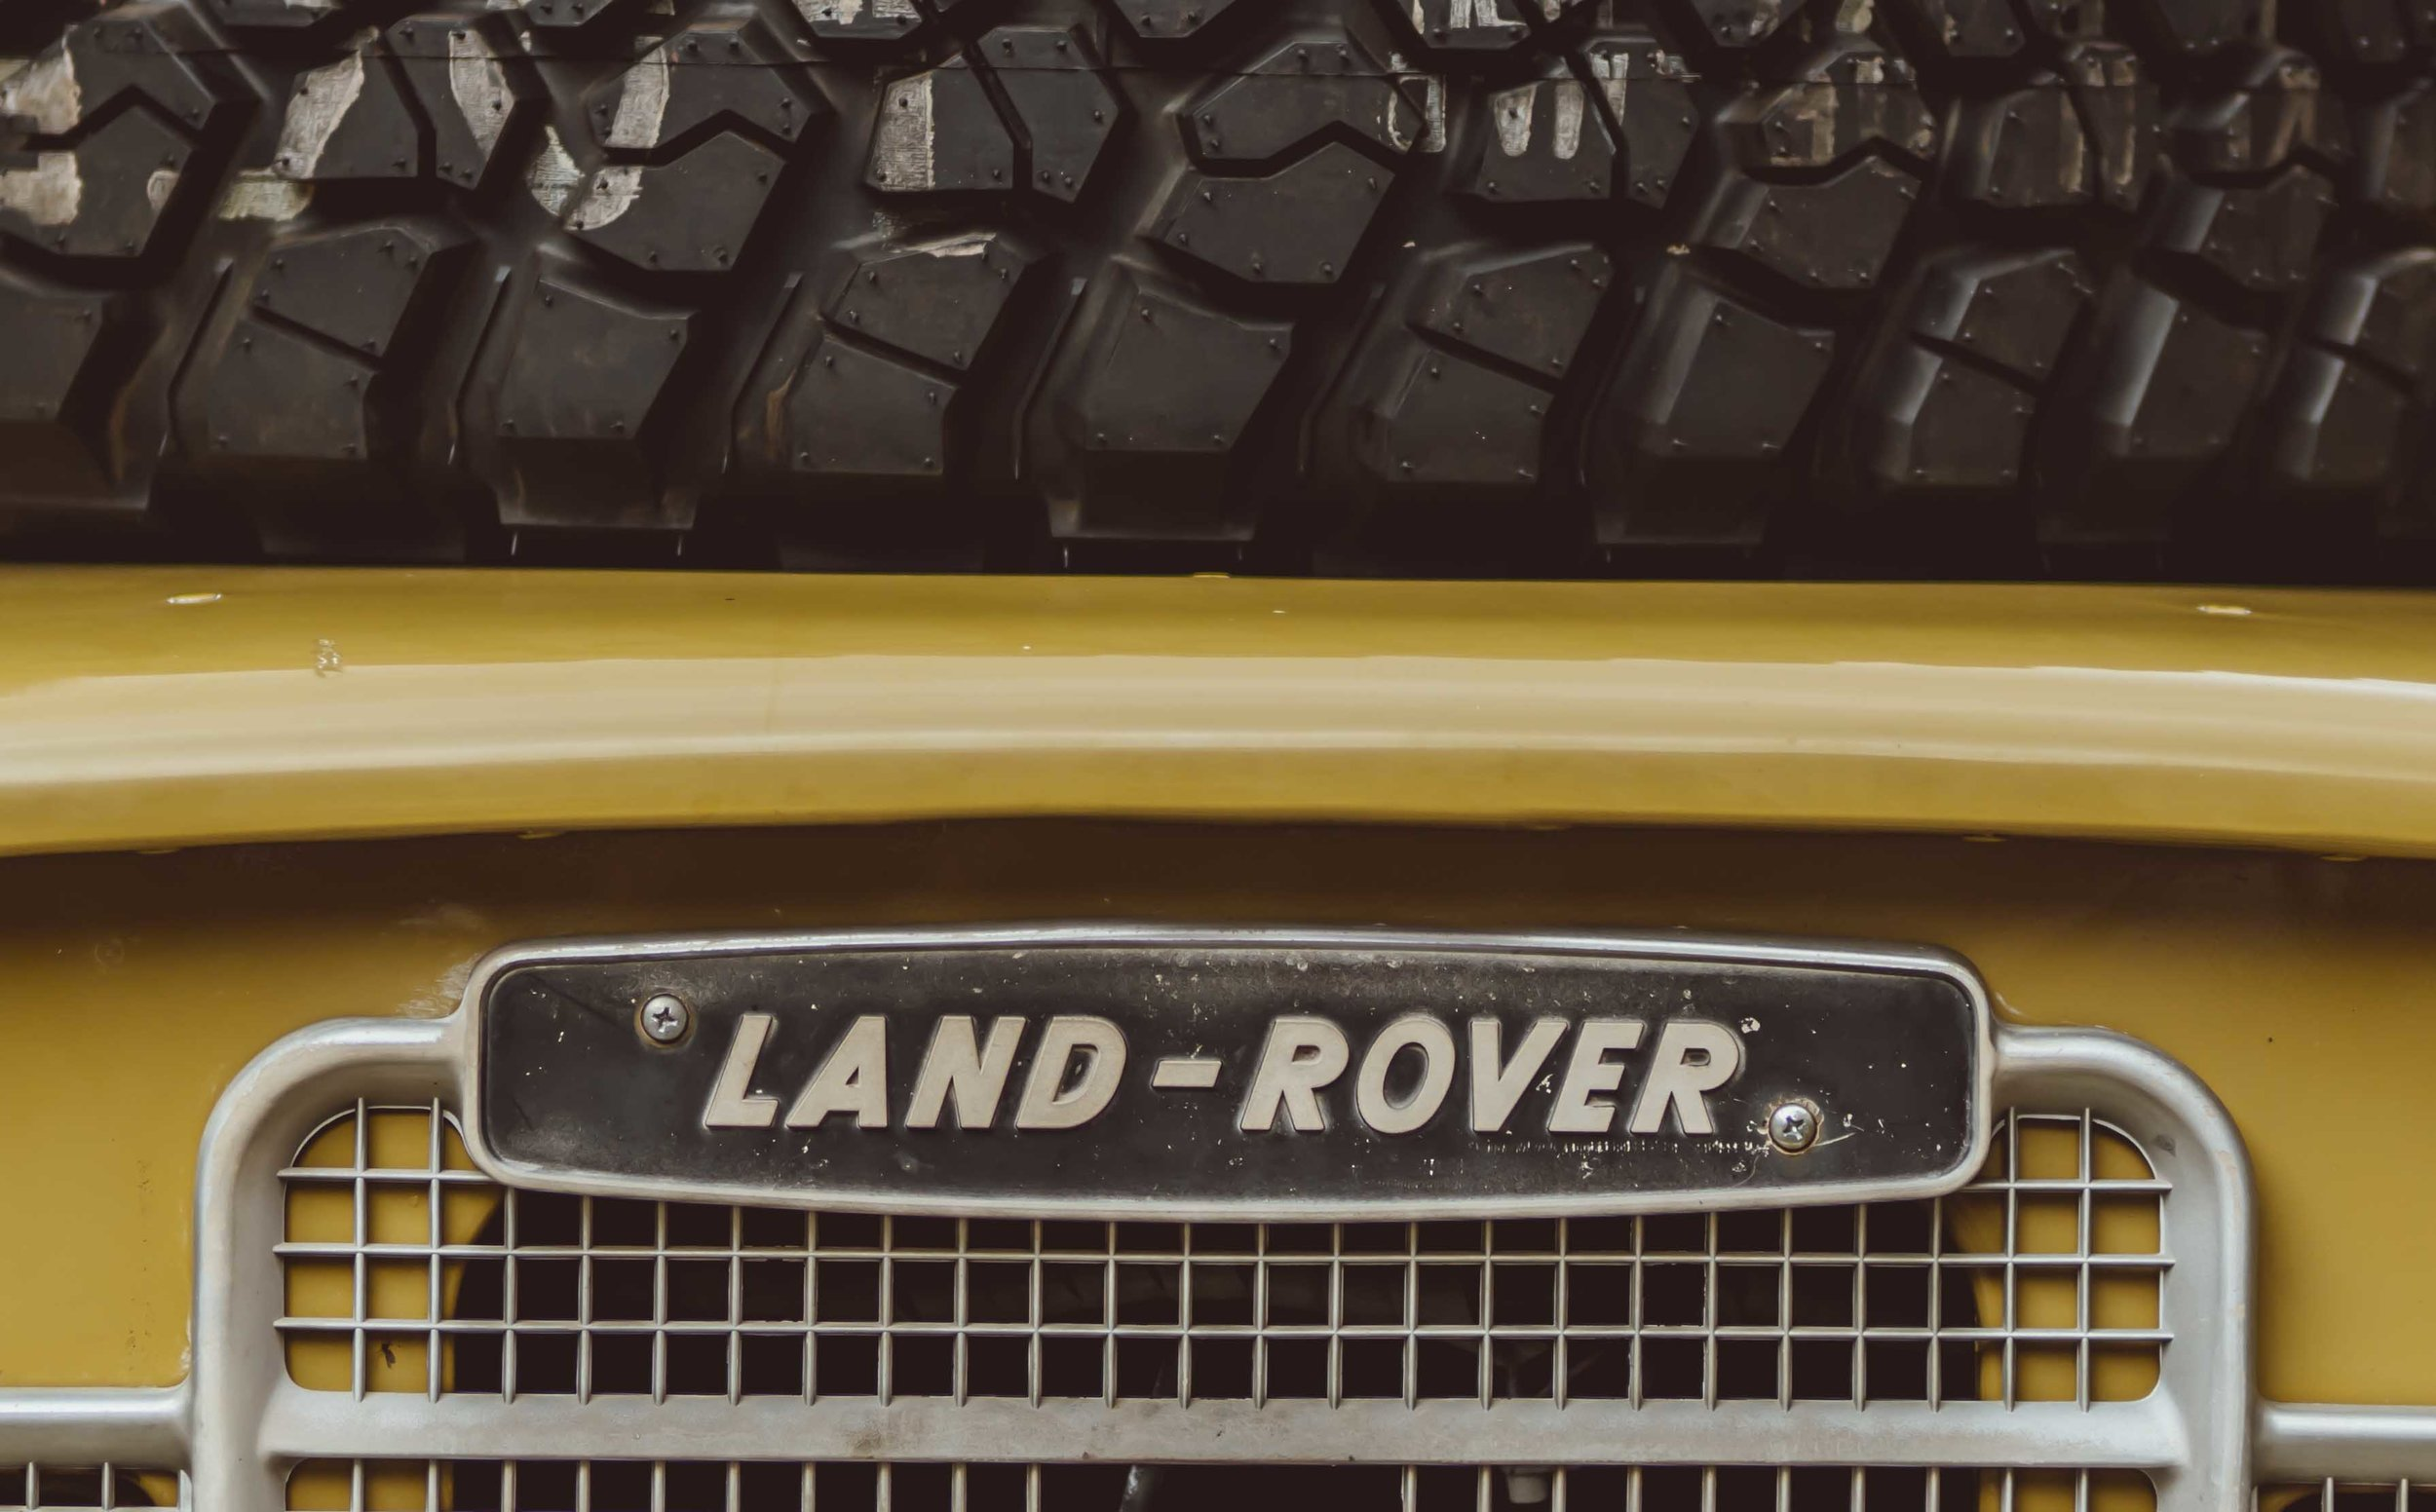 1975_Land_Rover_Series_III_109_Bahama_Gold_Large_0005_Layer 26.jpg